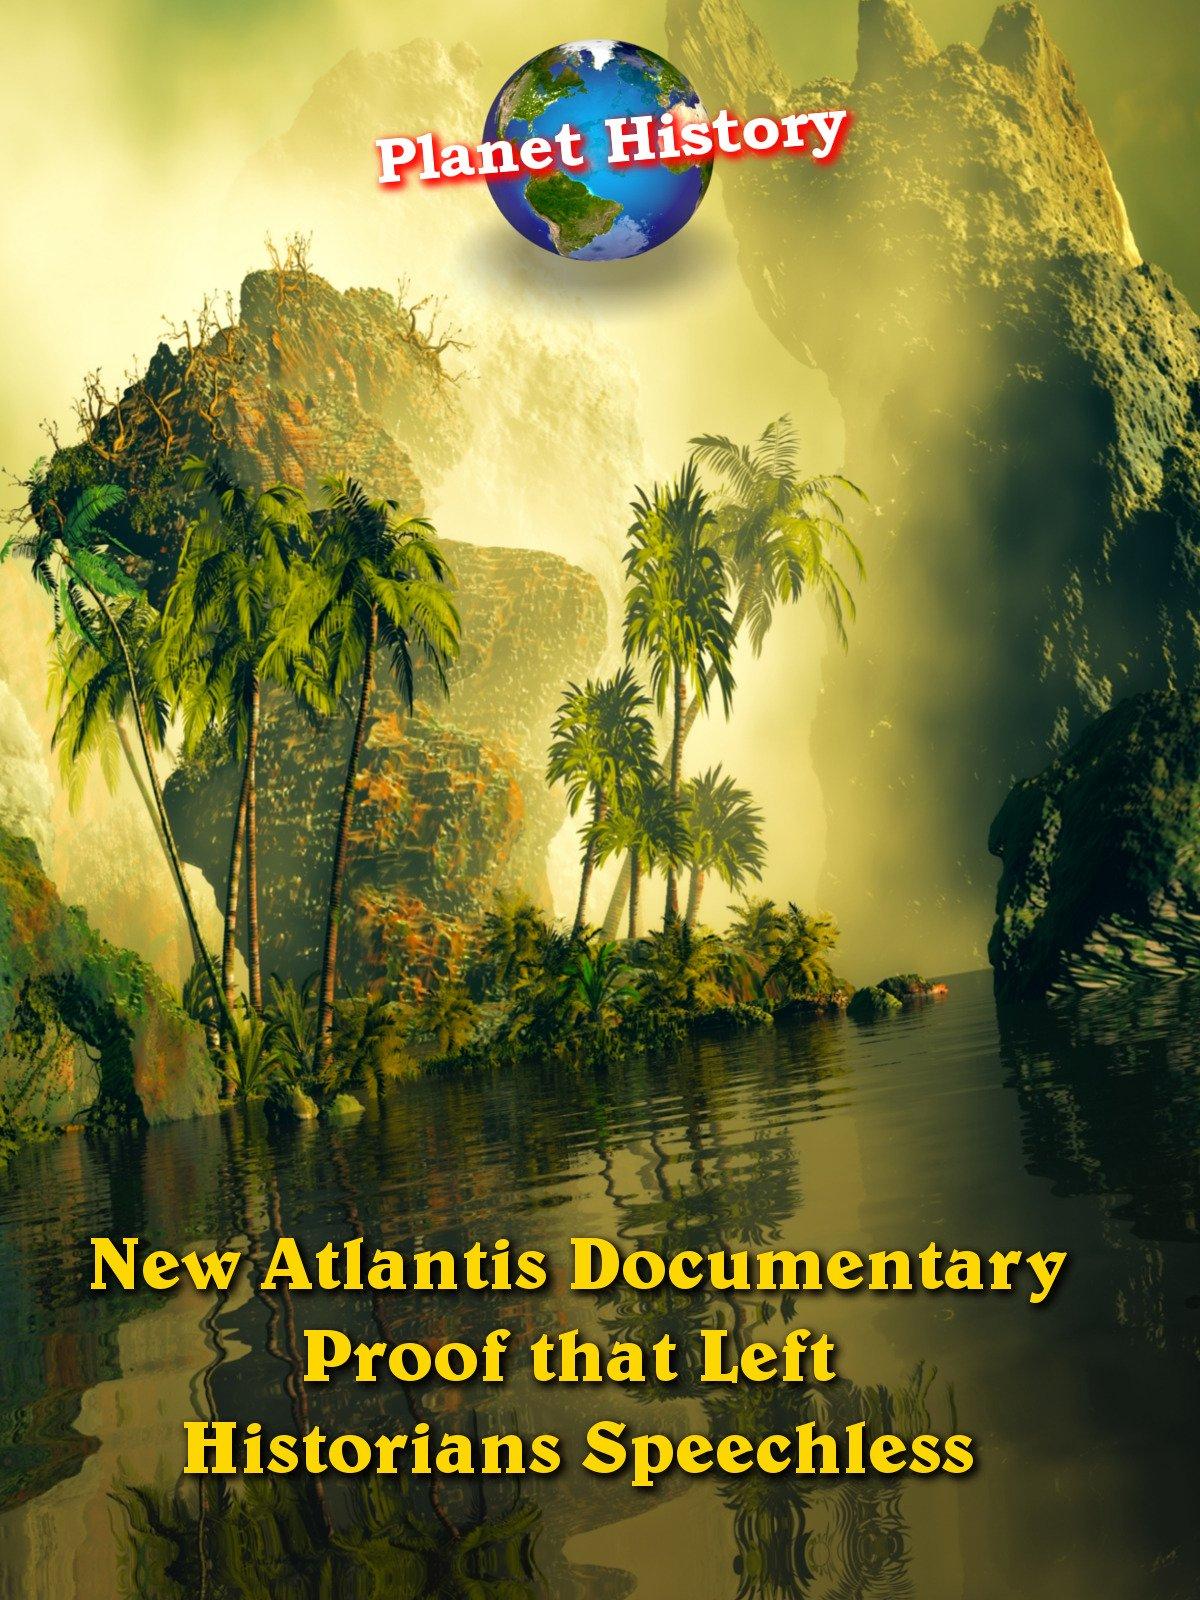 New Atlantis Documentary - Proof that Left Historians Speechless - Planet History